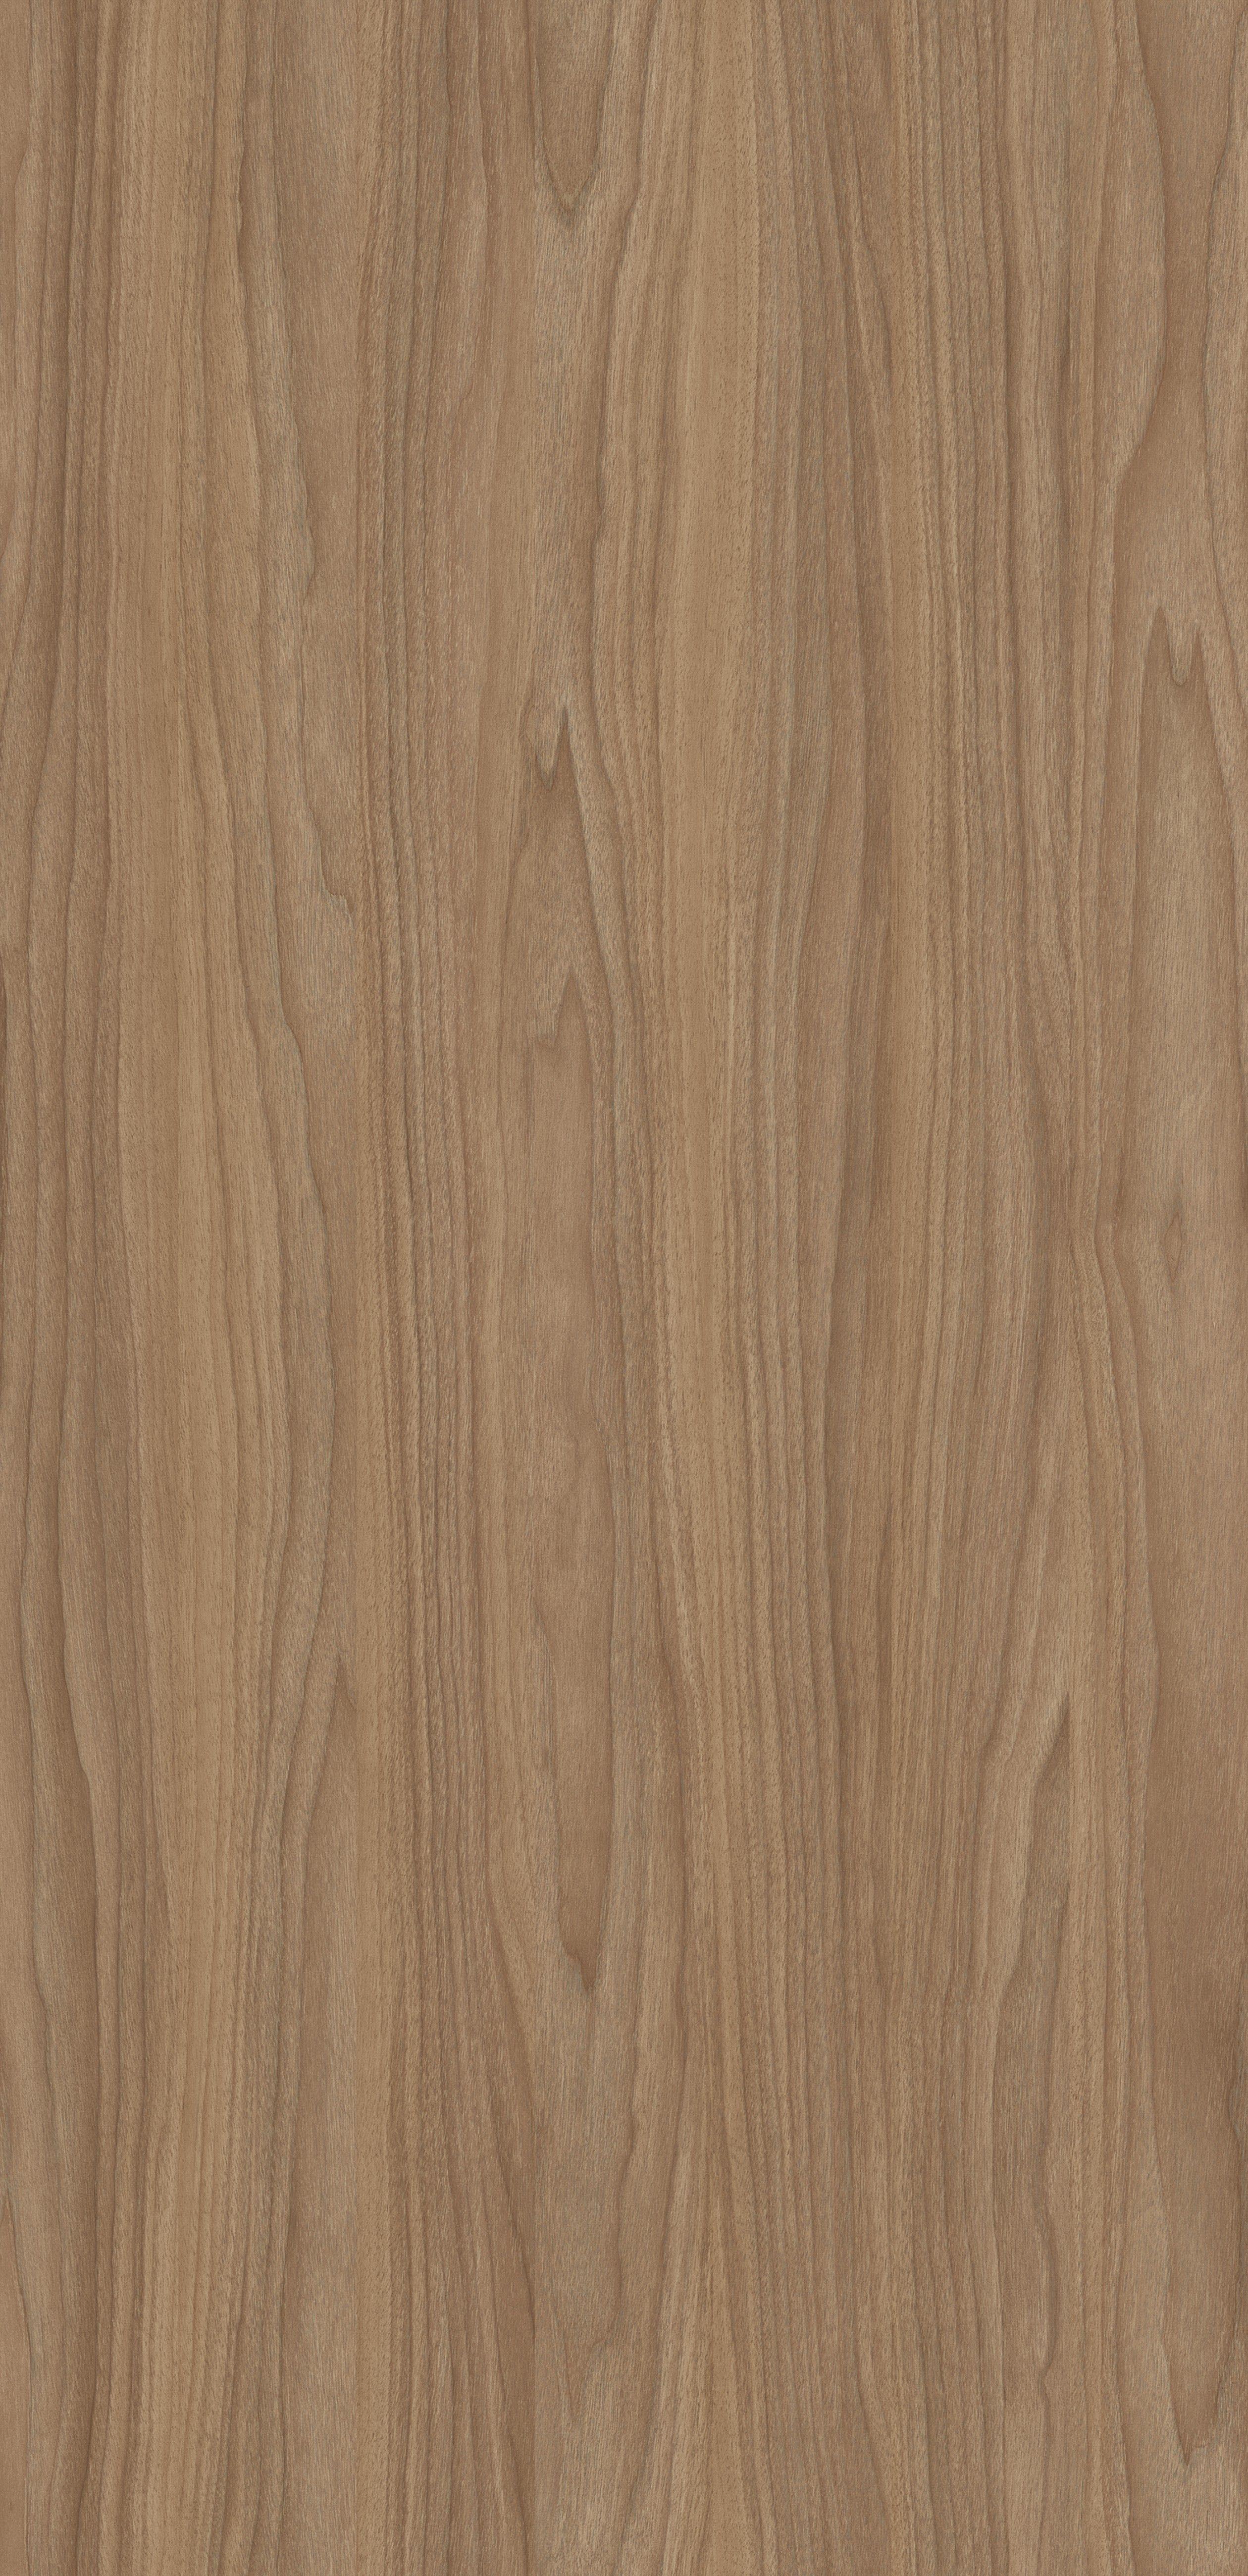 Cool Wood Laminate Flooring Trim Edging Metal Strip Only In Interioropedia Com Wood Laminate Flooring Wood Texture Veneer Texture